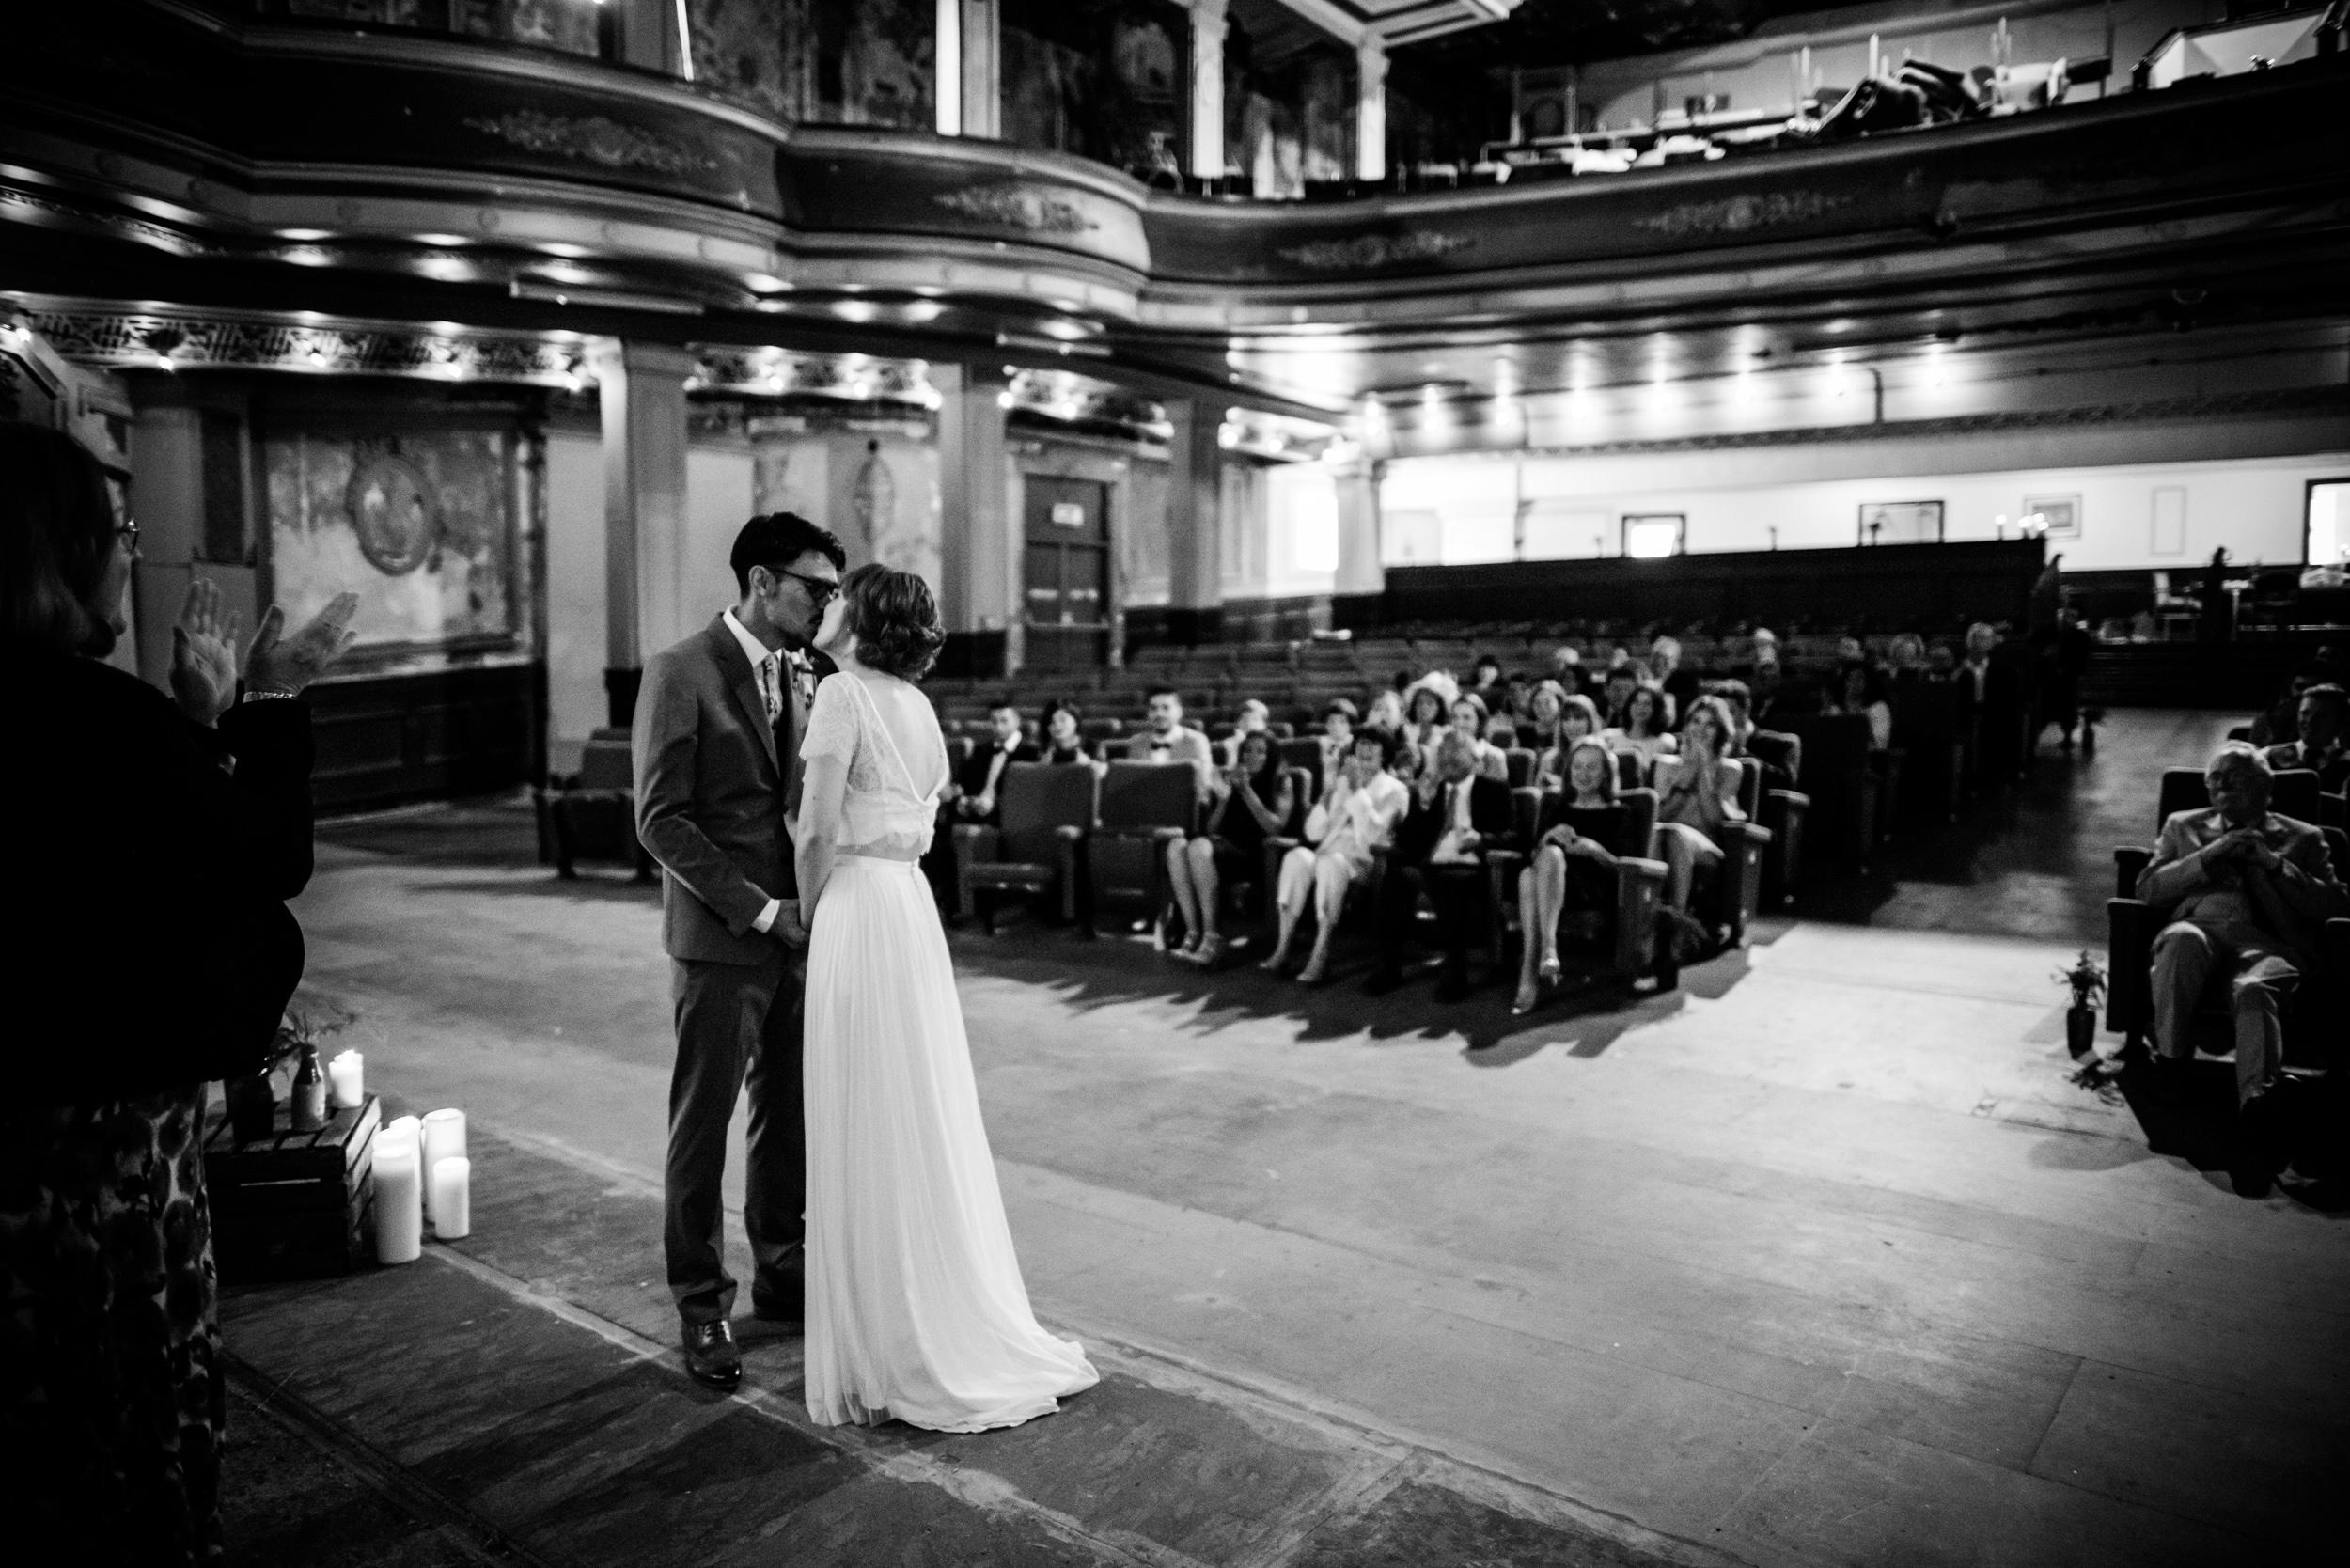 Jill-Kate-Beaumont-Lace-Sheffield-Wedding-8.jpg